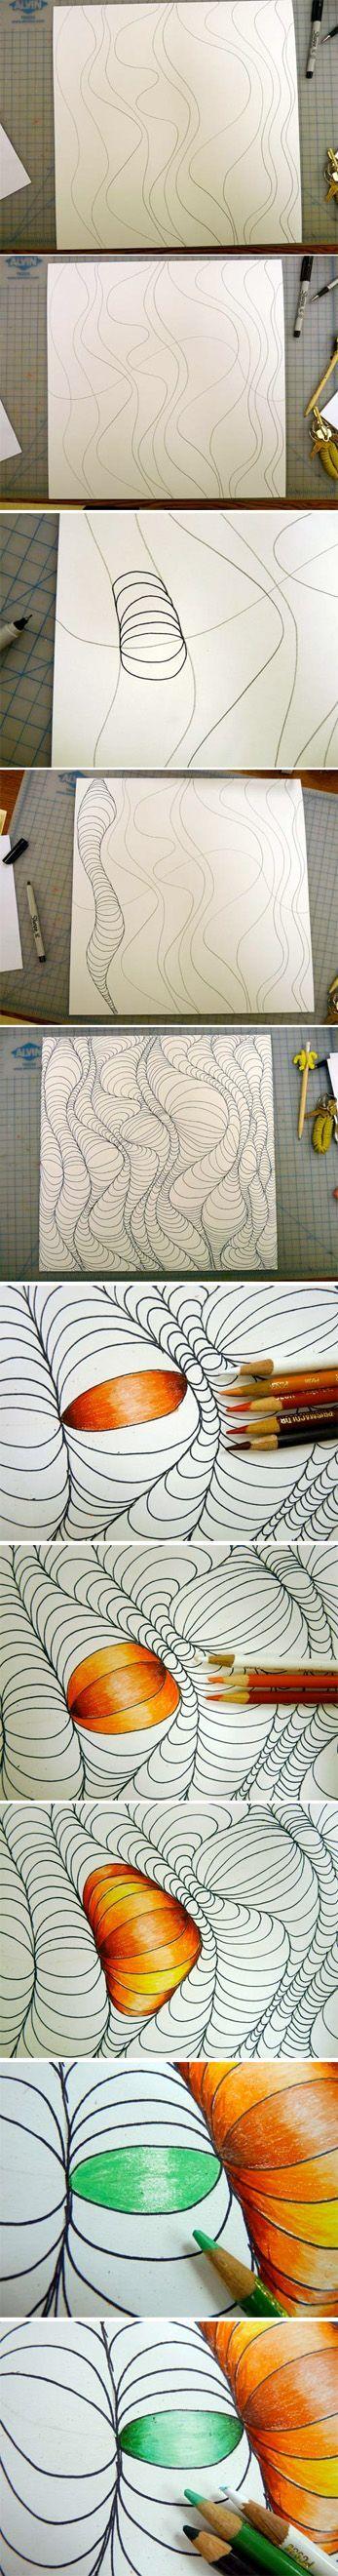 Optical Design                                                                                                                                                      More